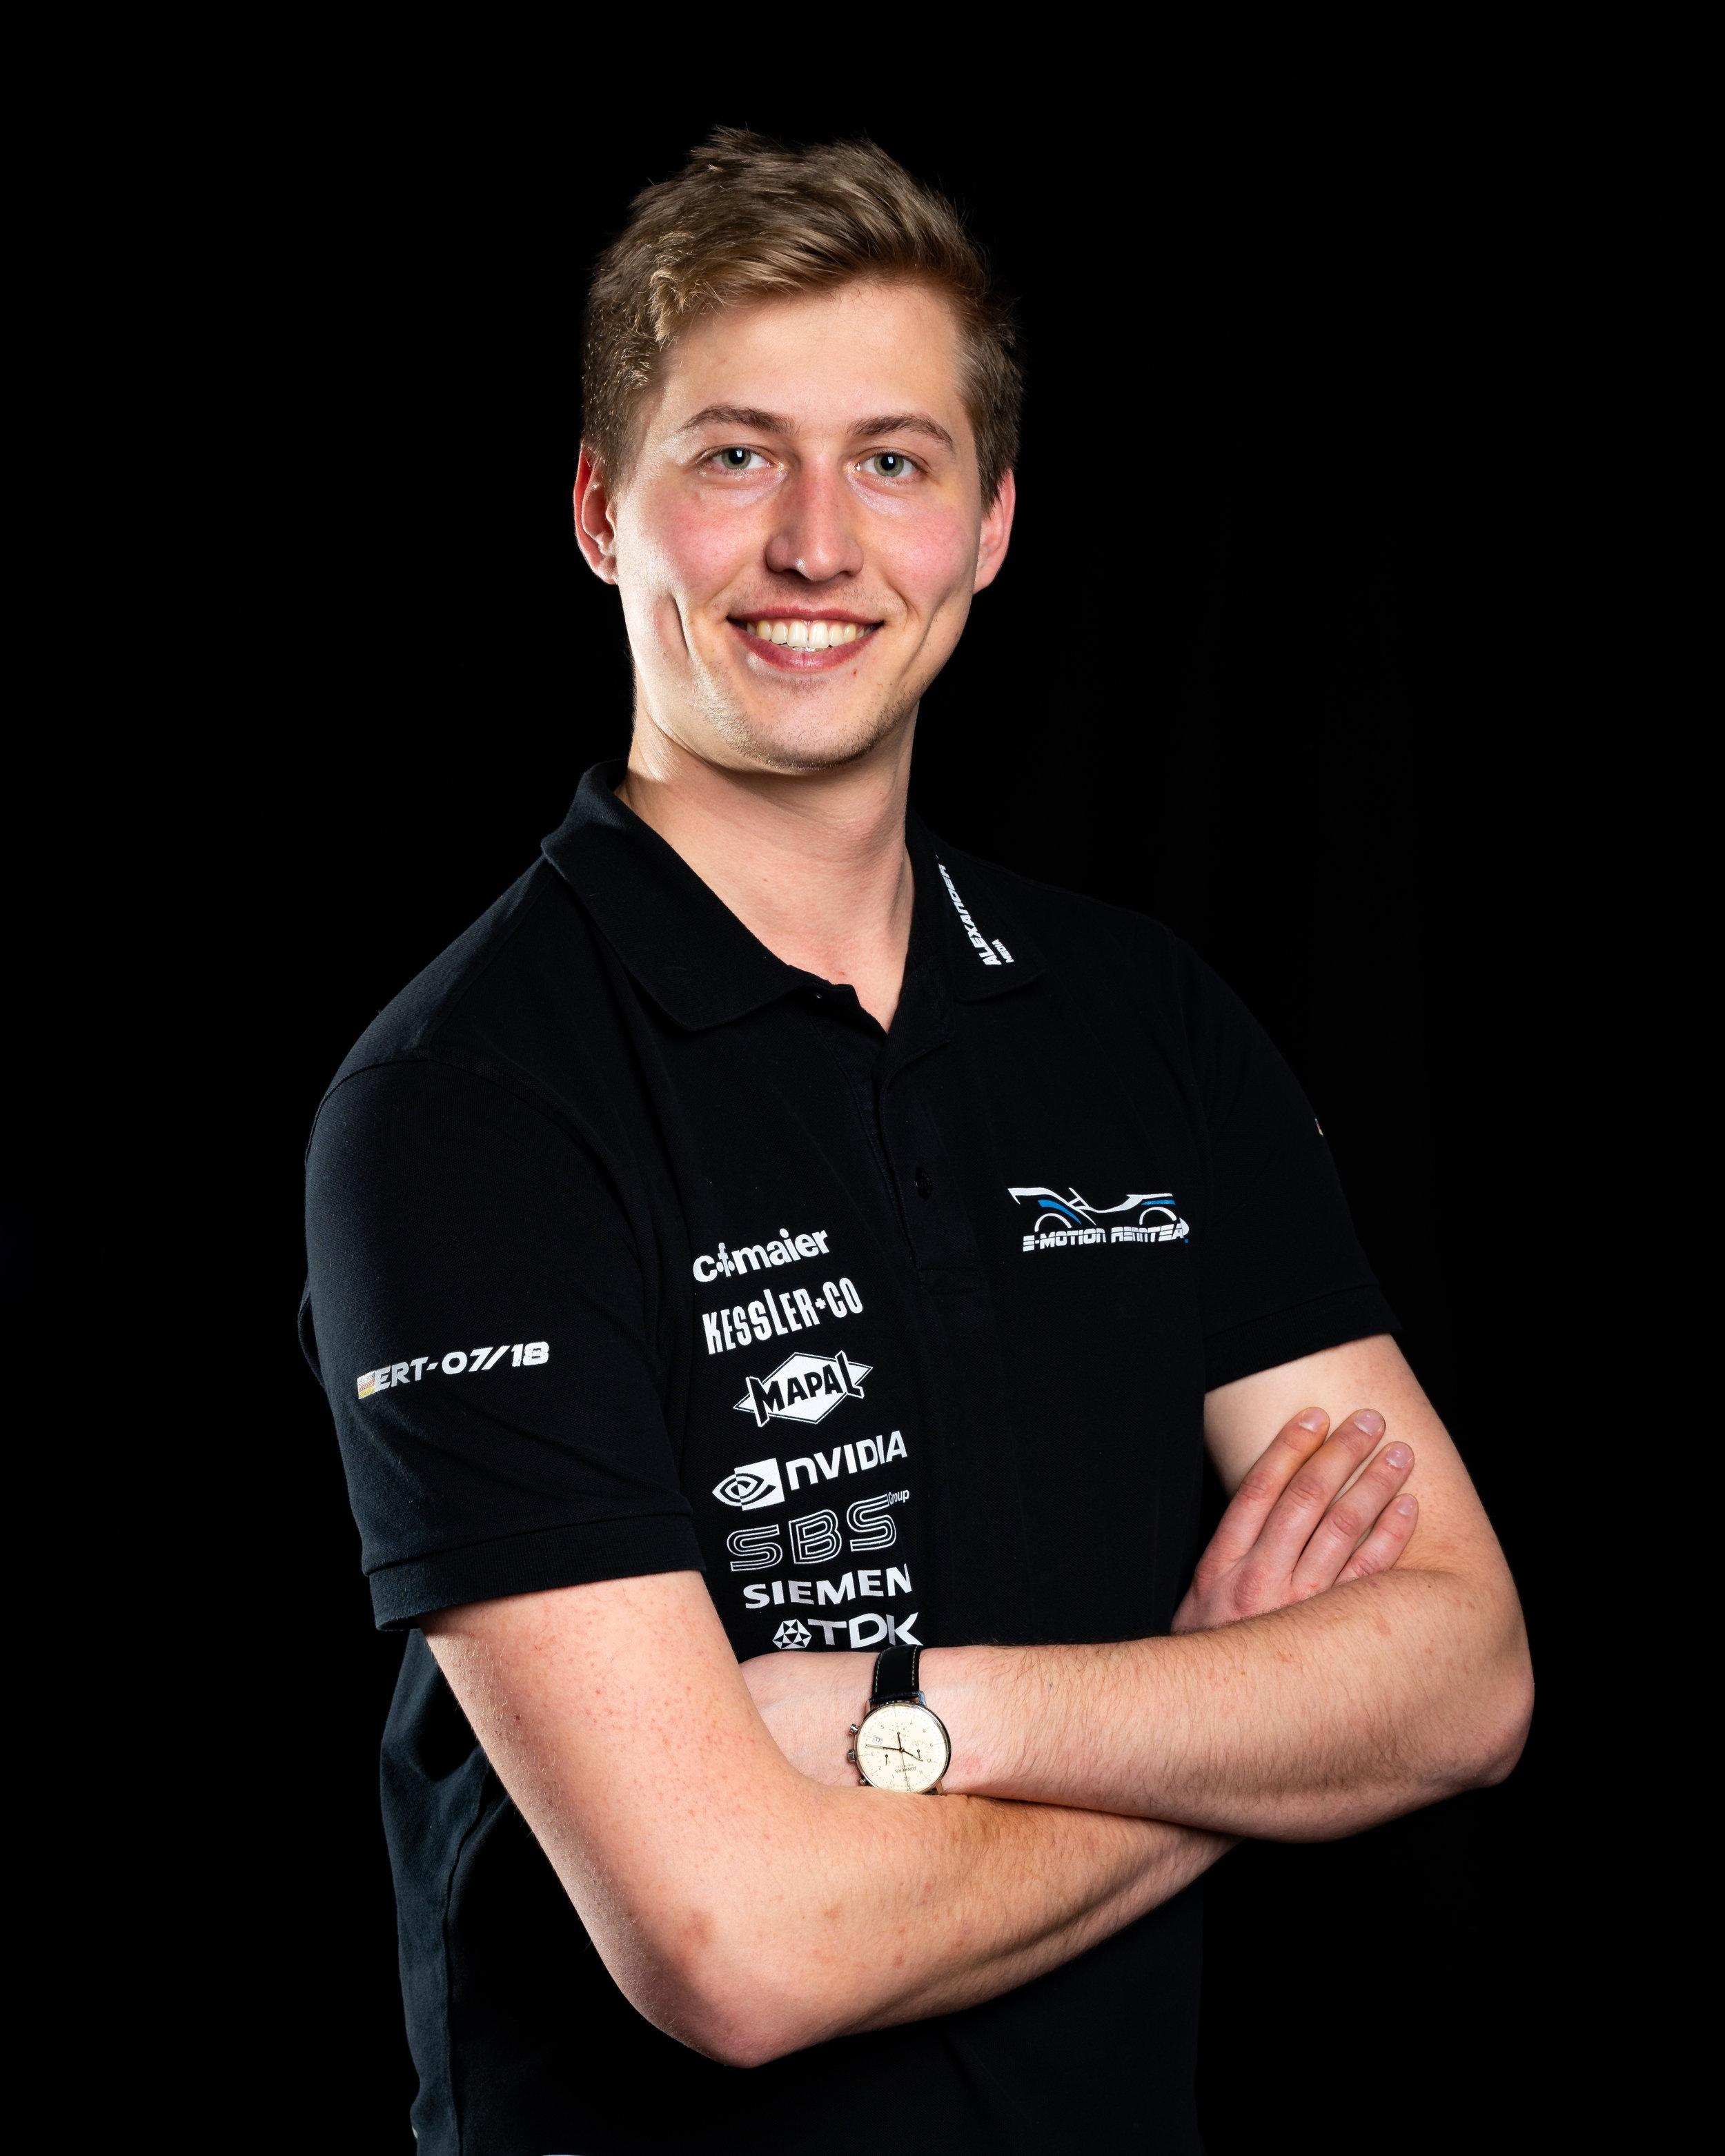 Alexander Lingel